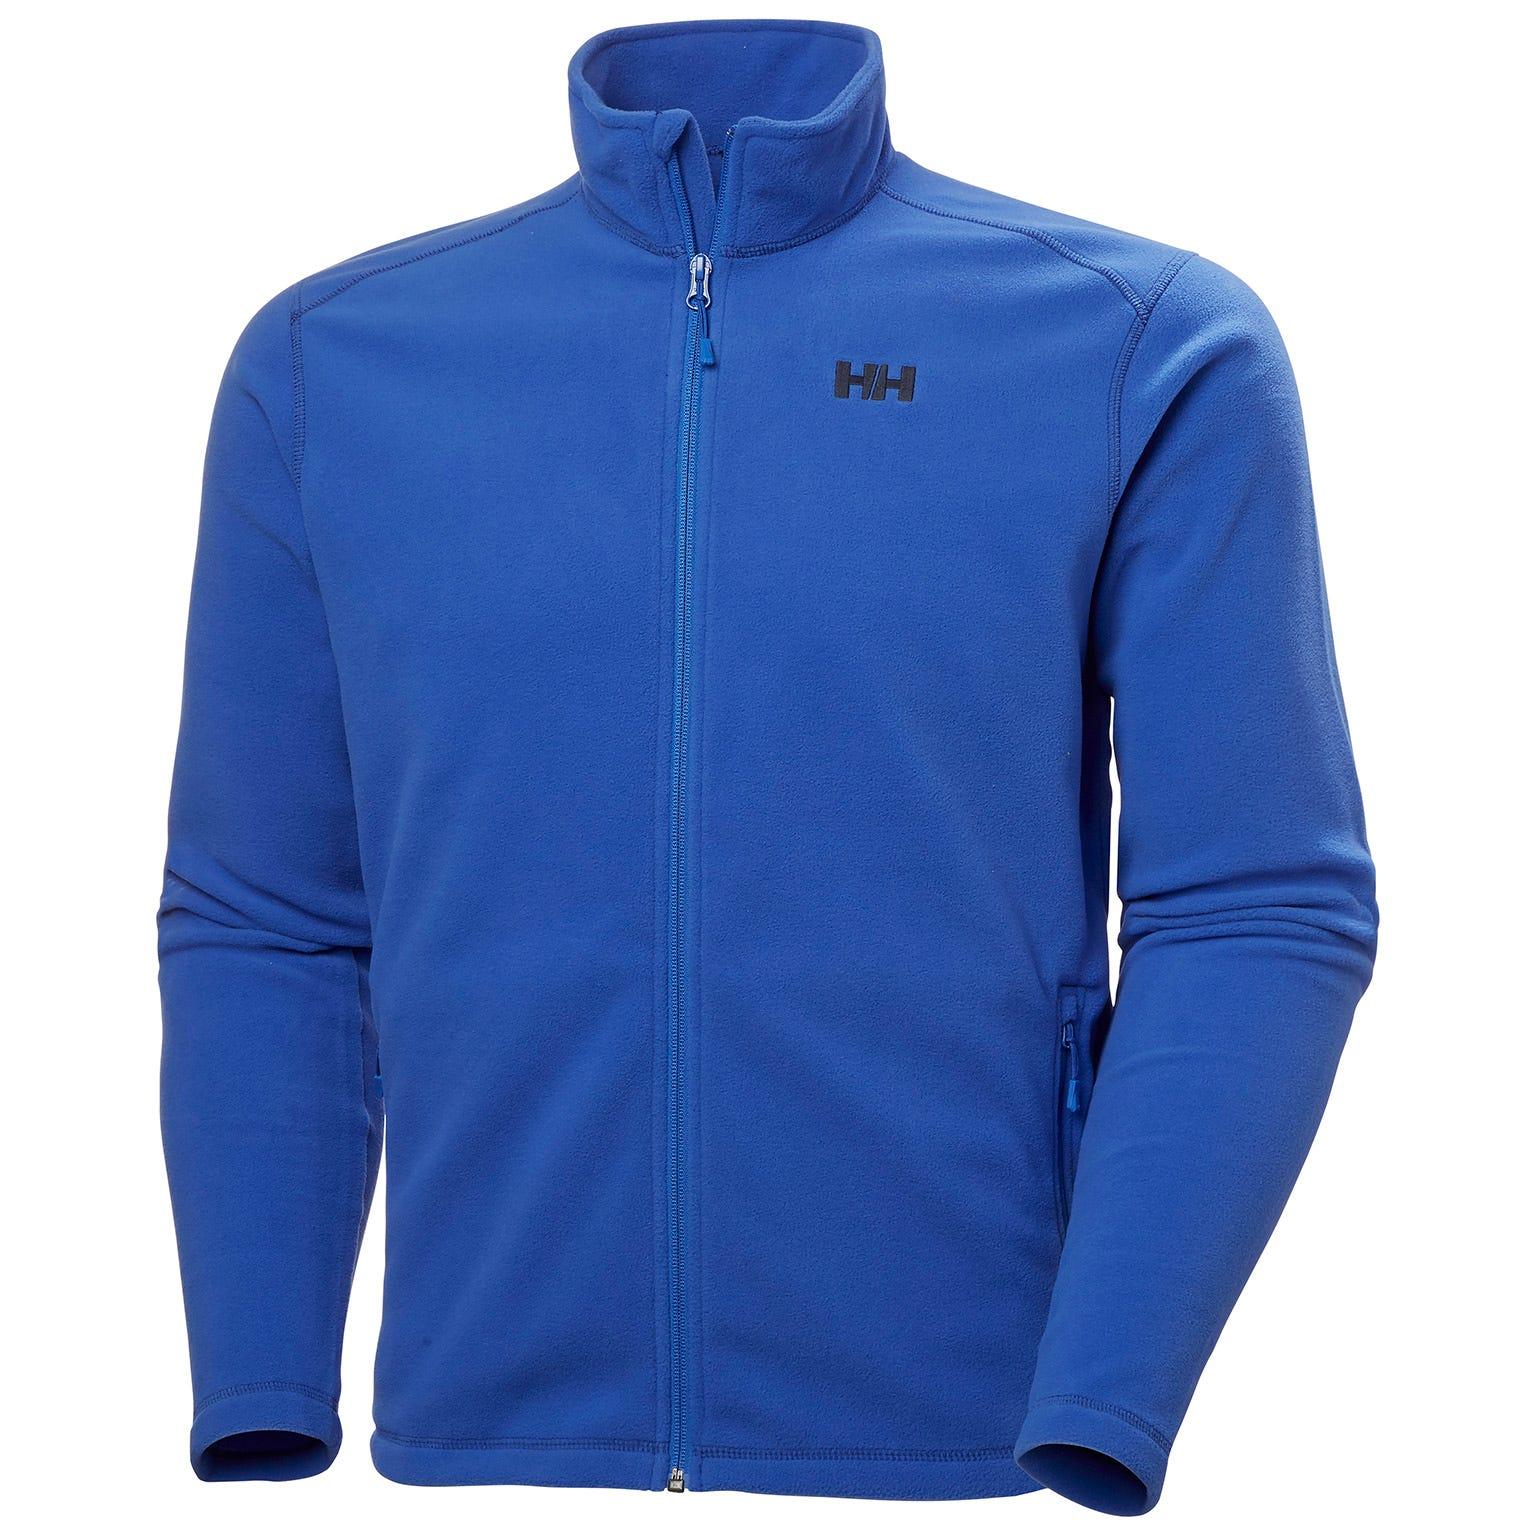 Mens Daybreaker Full Zip Fleece Jacket | Uk Helly Hansen Mens Blue XL